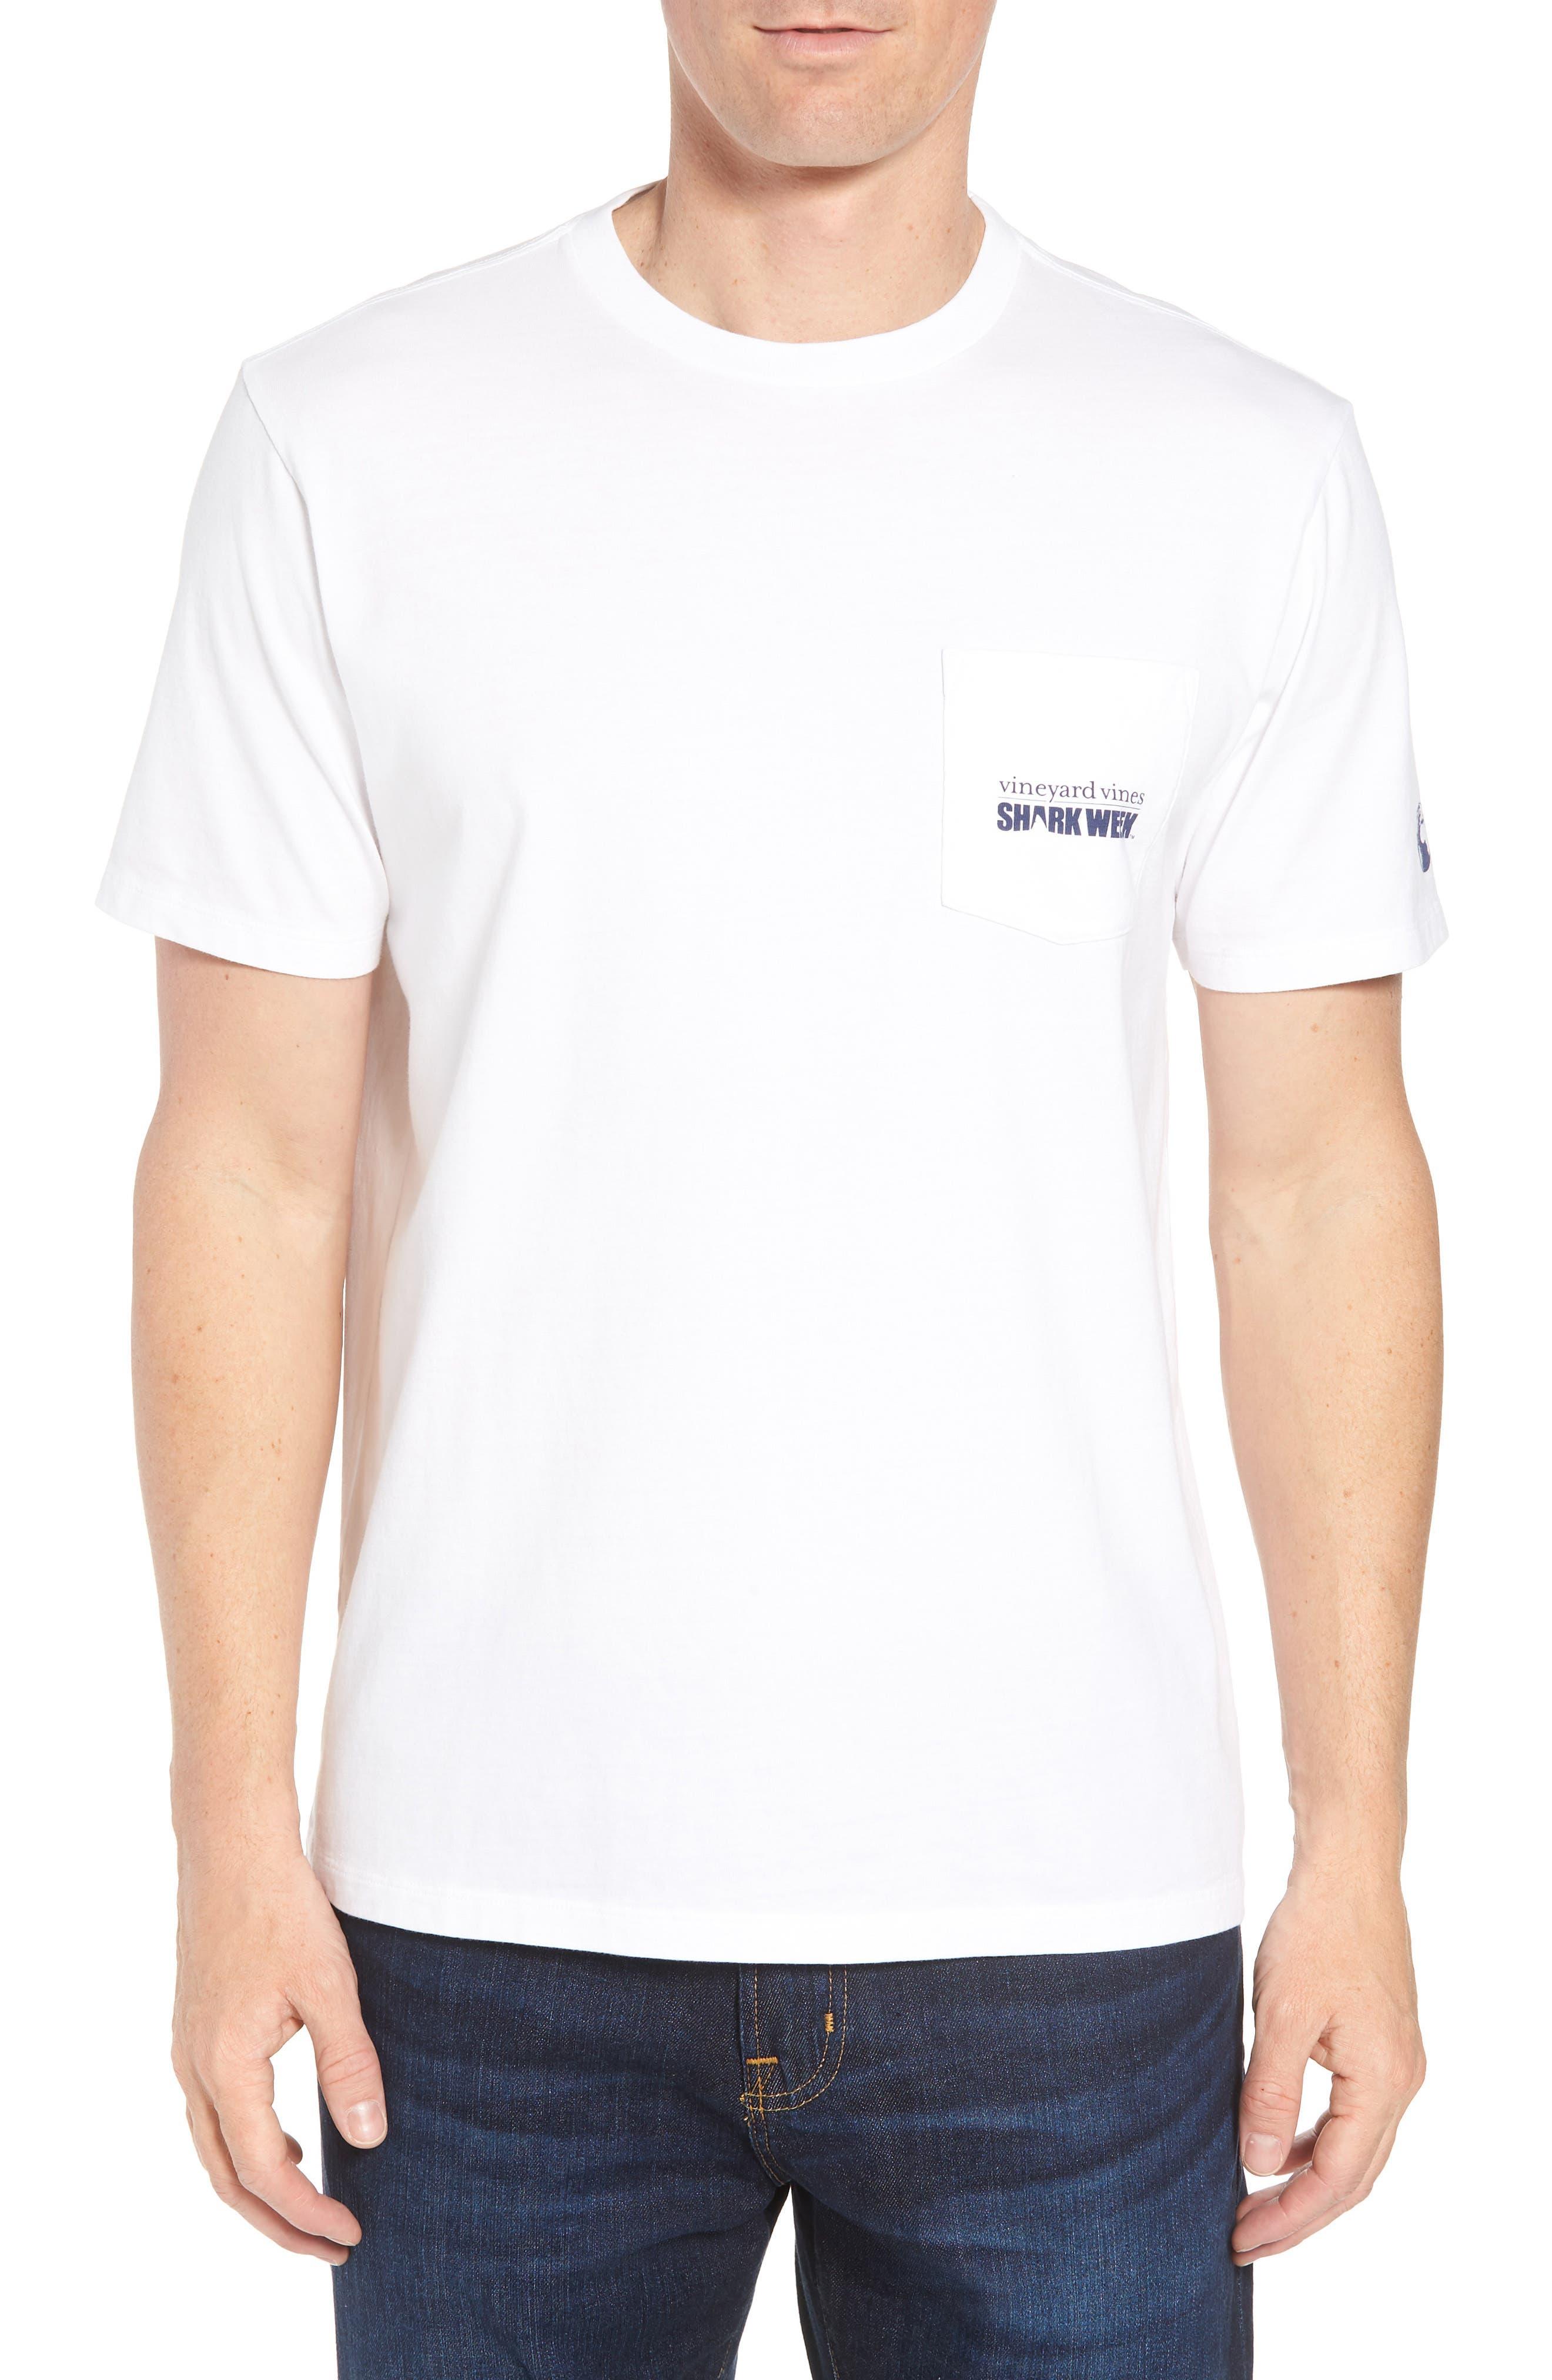 x Shark Week<sup>™</sup> Logo Pocket T-Shirt,                             Main thumbnail 1, color,                             White Cap